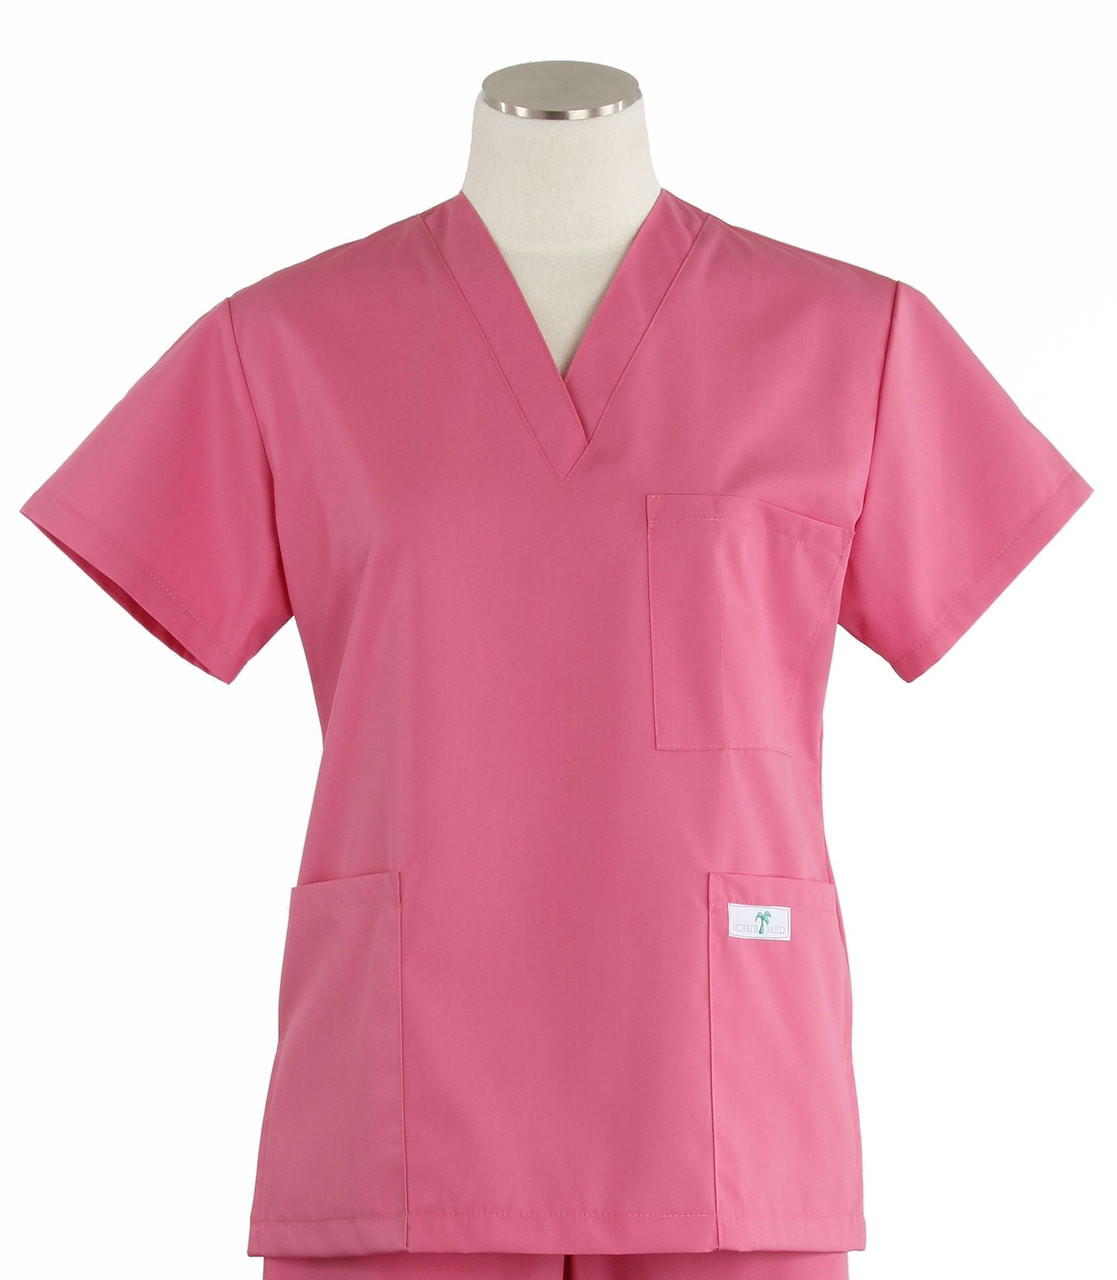 a065a48b1c5 Scrub Med Womens Solid V-Poc Scrub Top Mesa Rose - Scrub Med